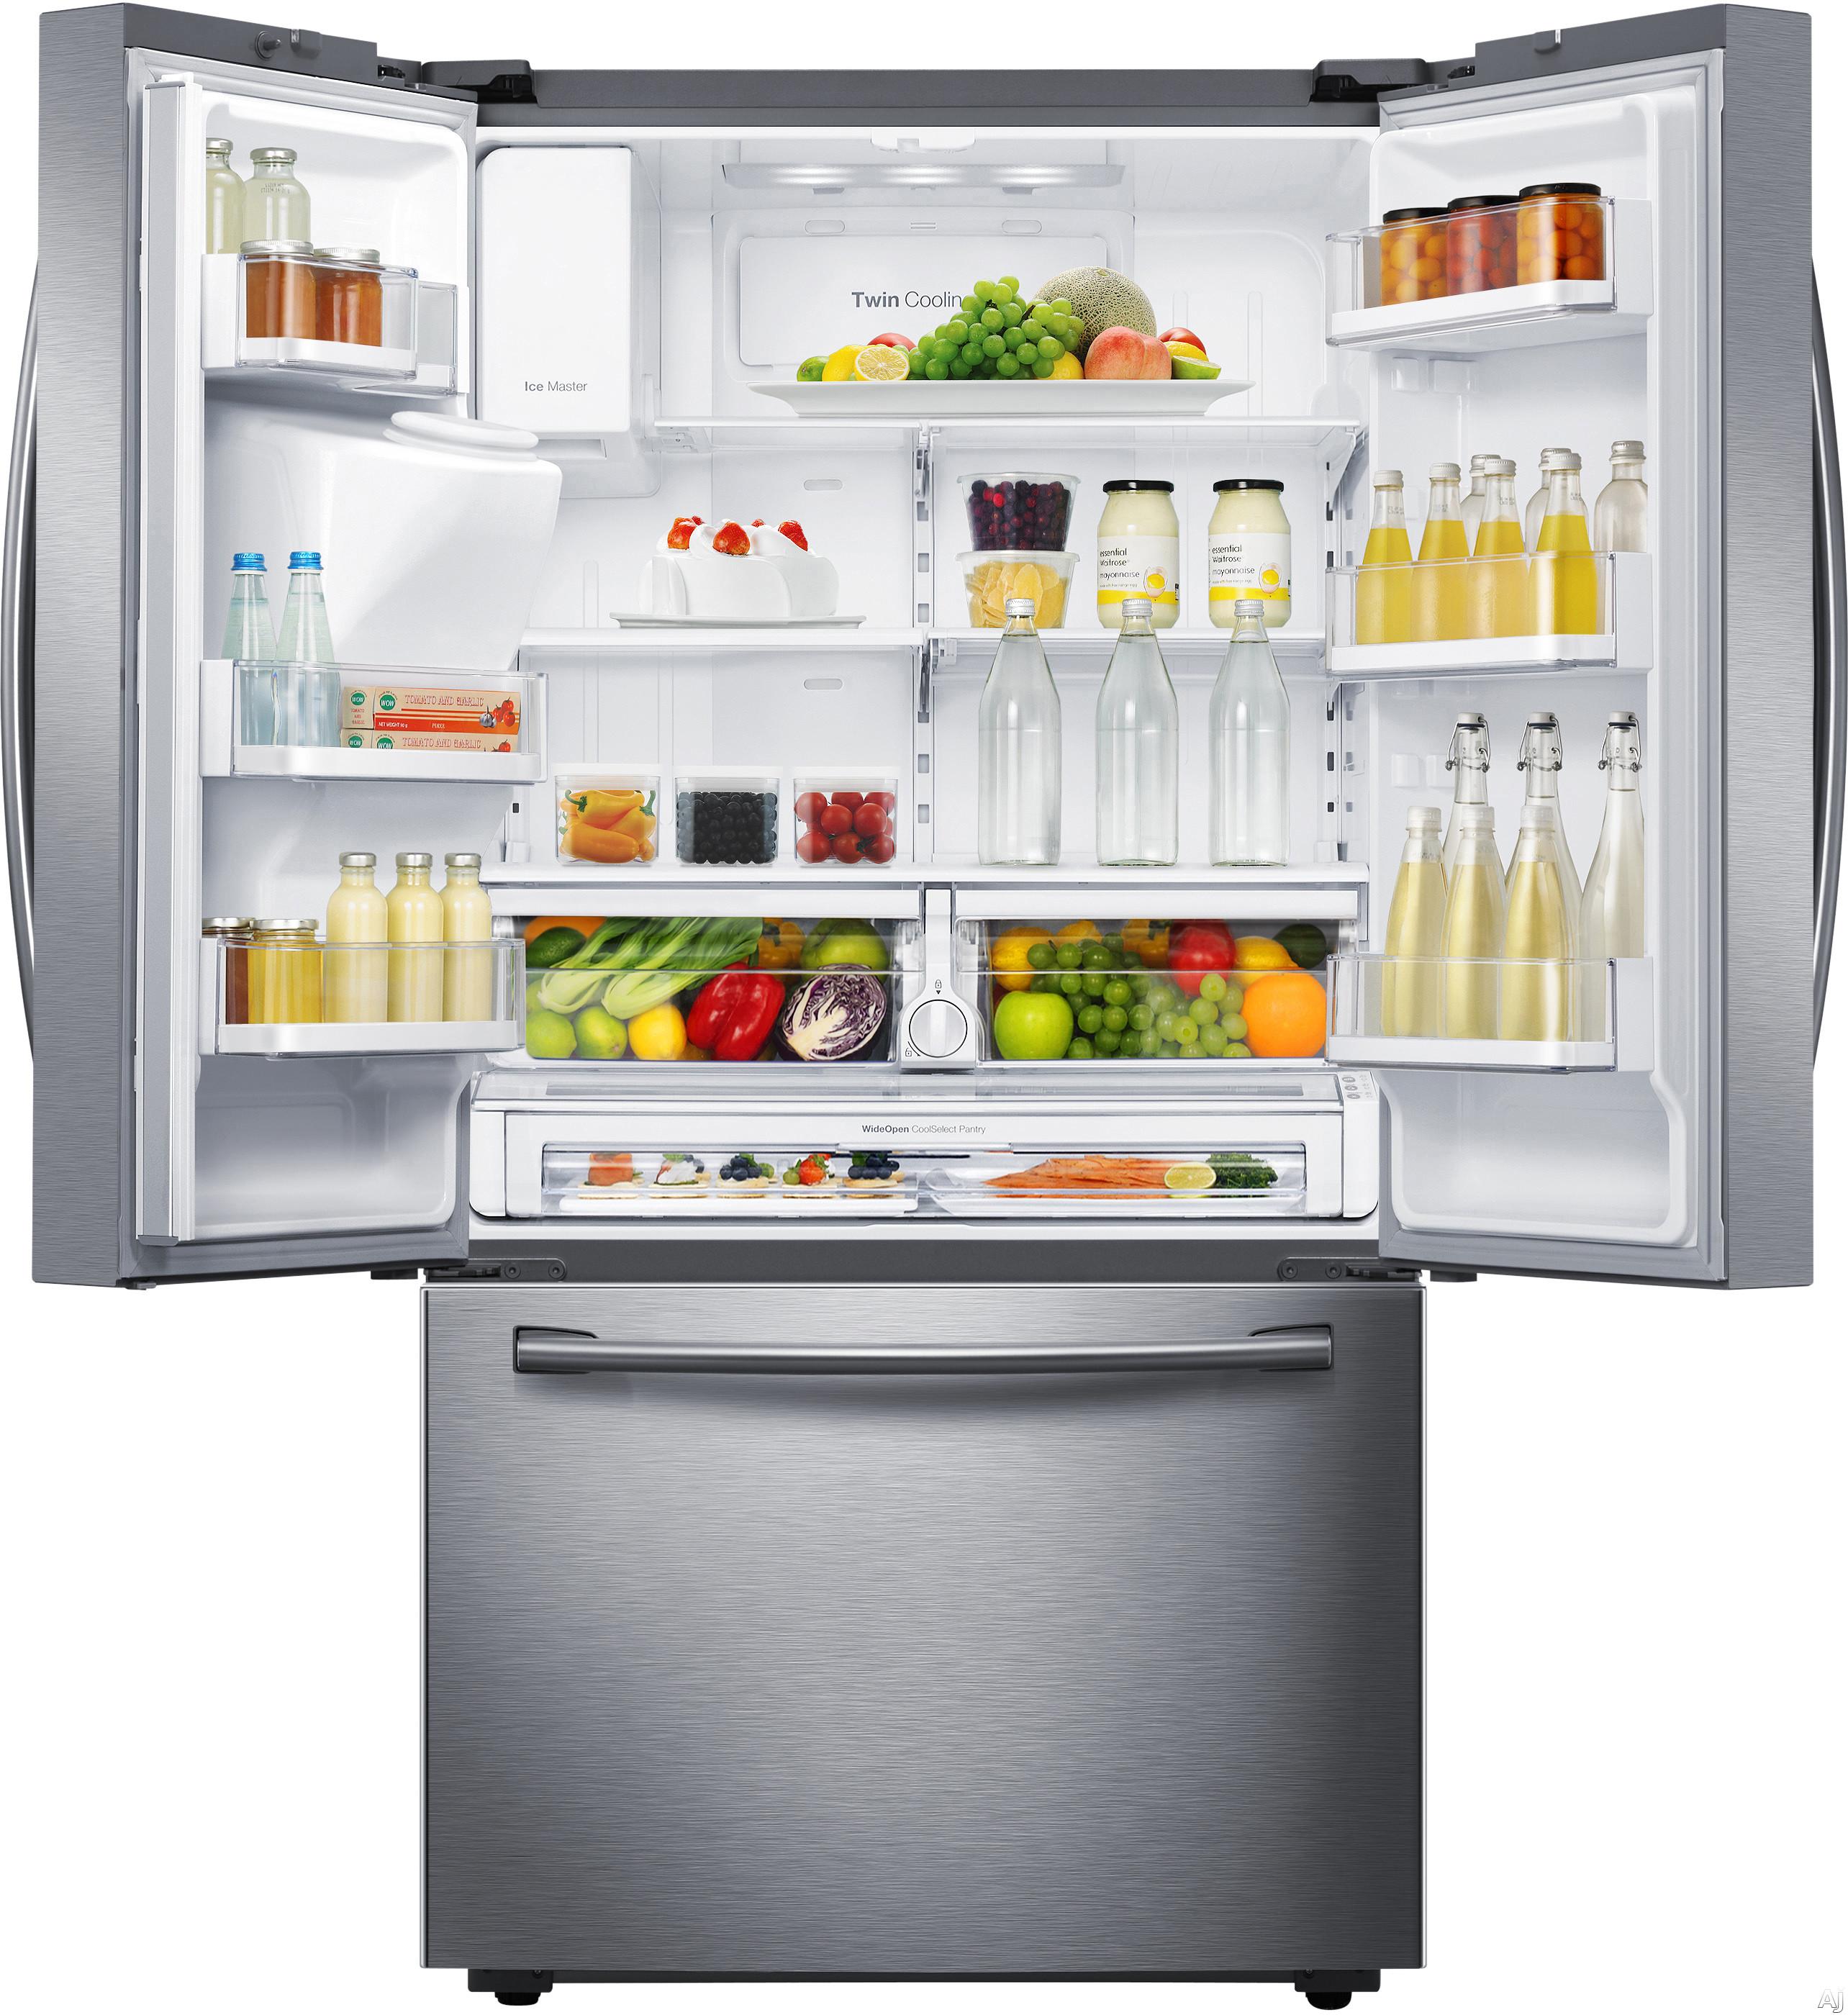 Samsung rf23hcedbsr 22 5 cu ft counter depth french door for 19 5 cu ft french door refrigerator